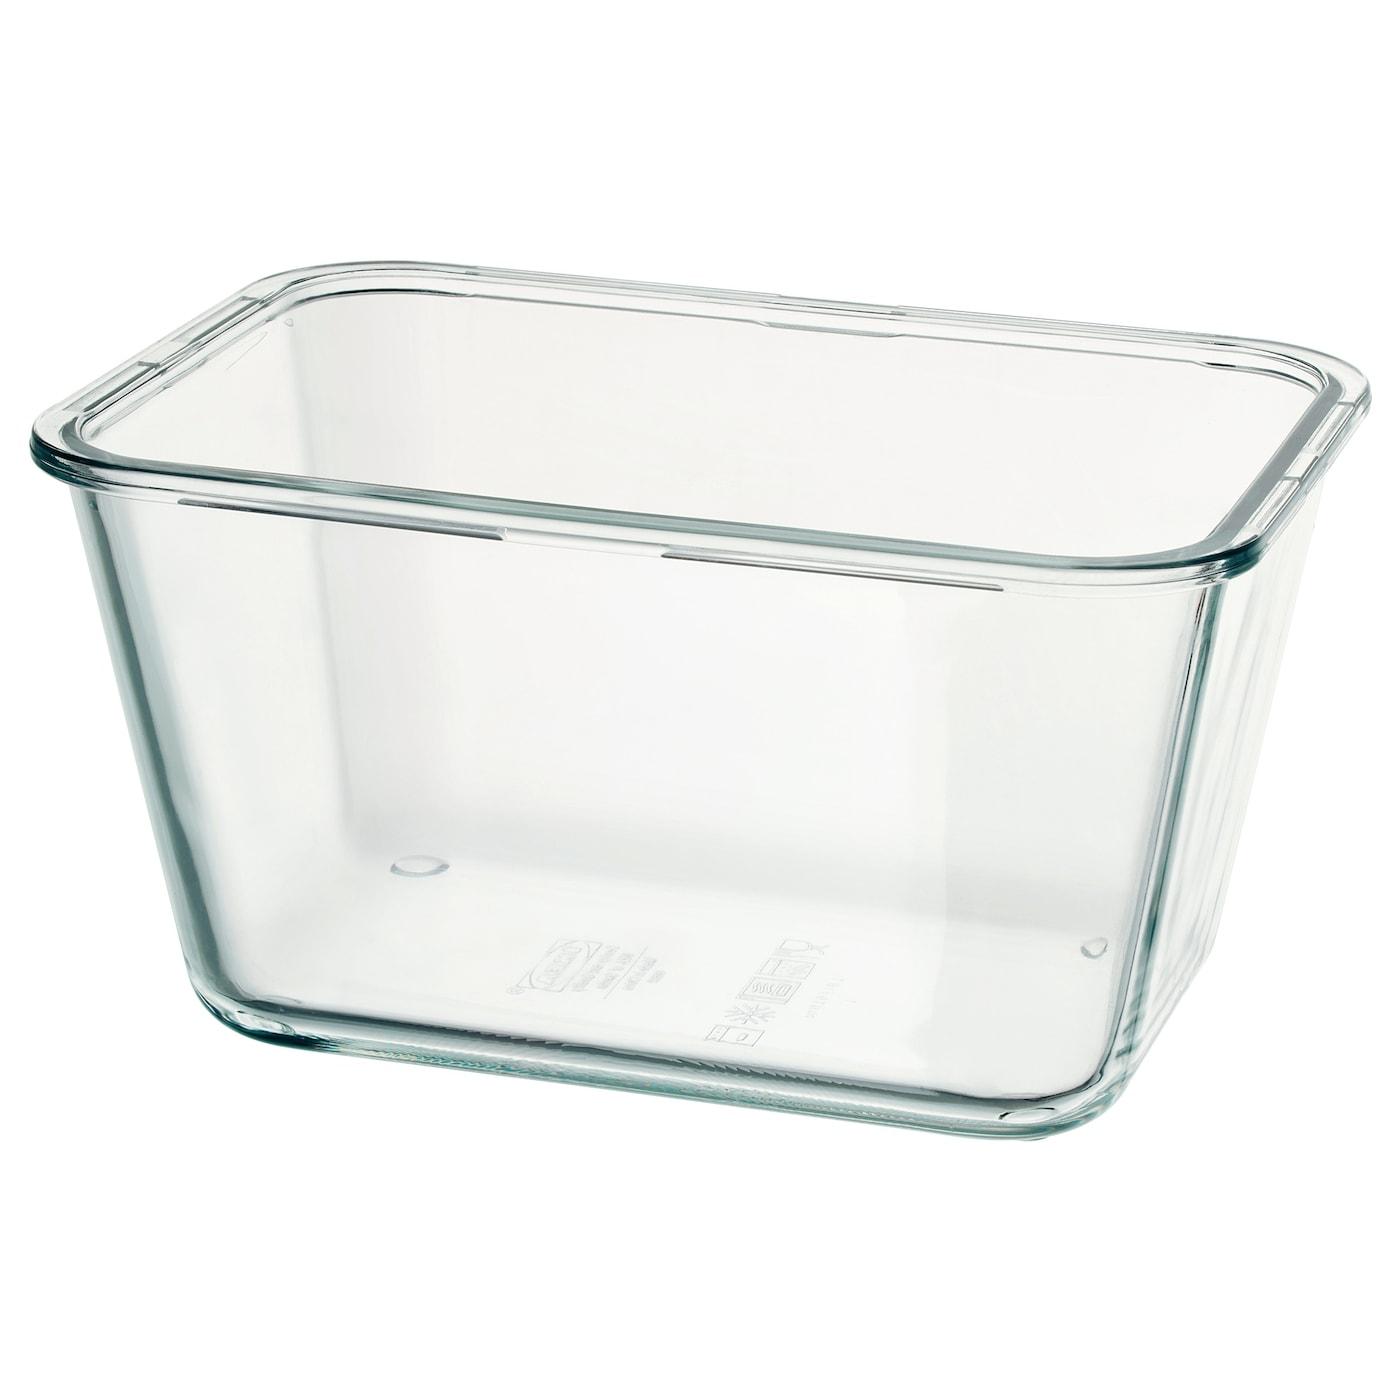 IKEA 365+ rectangular glass, glass